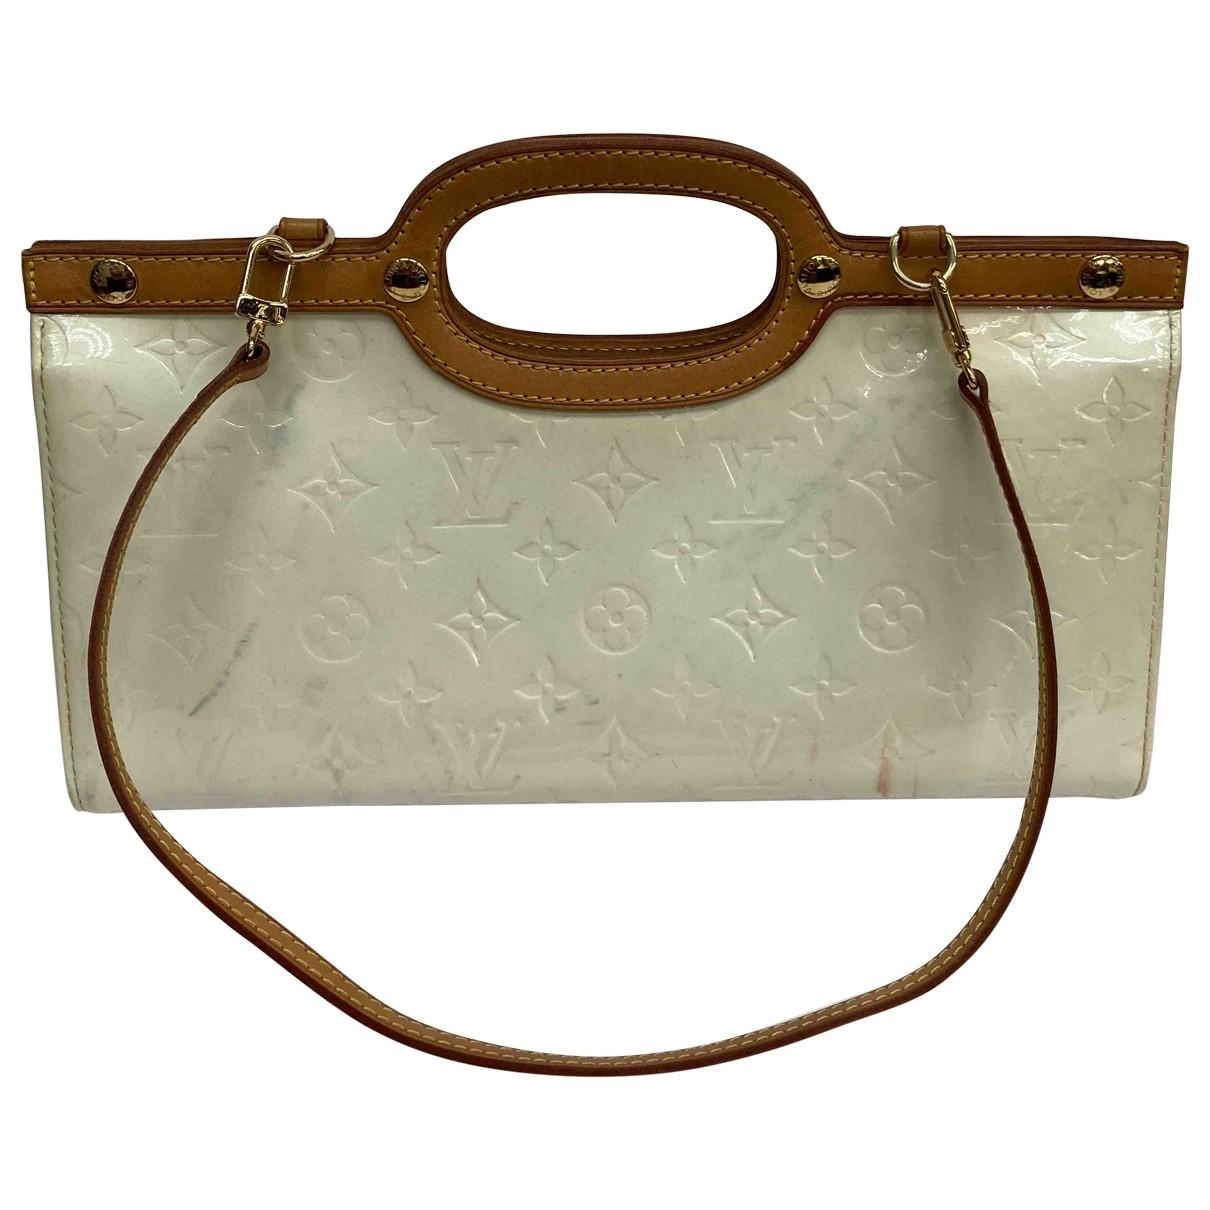 Louis Vuitton Roxbury Beige Patent leather handbag for Women \N